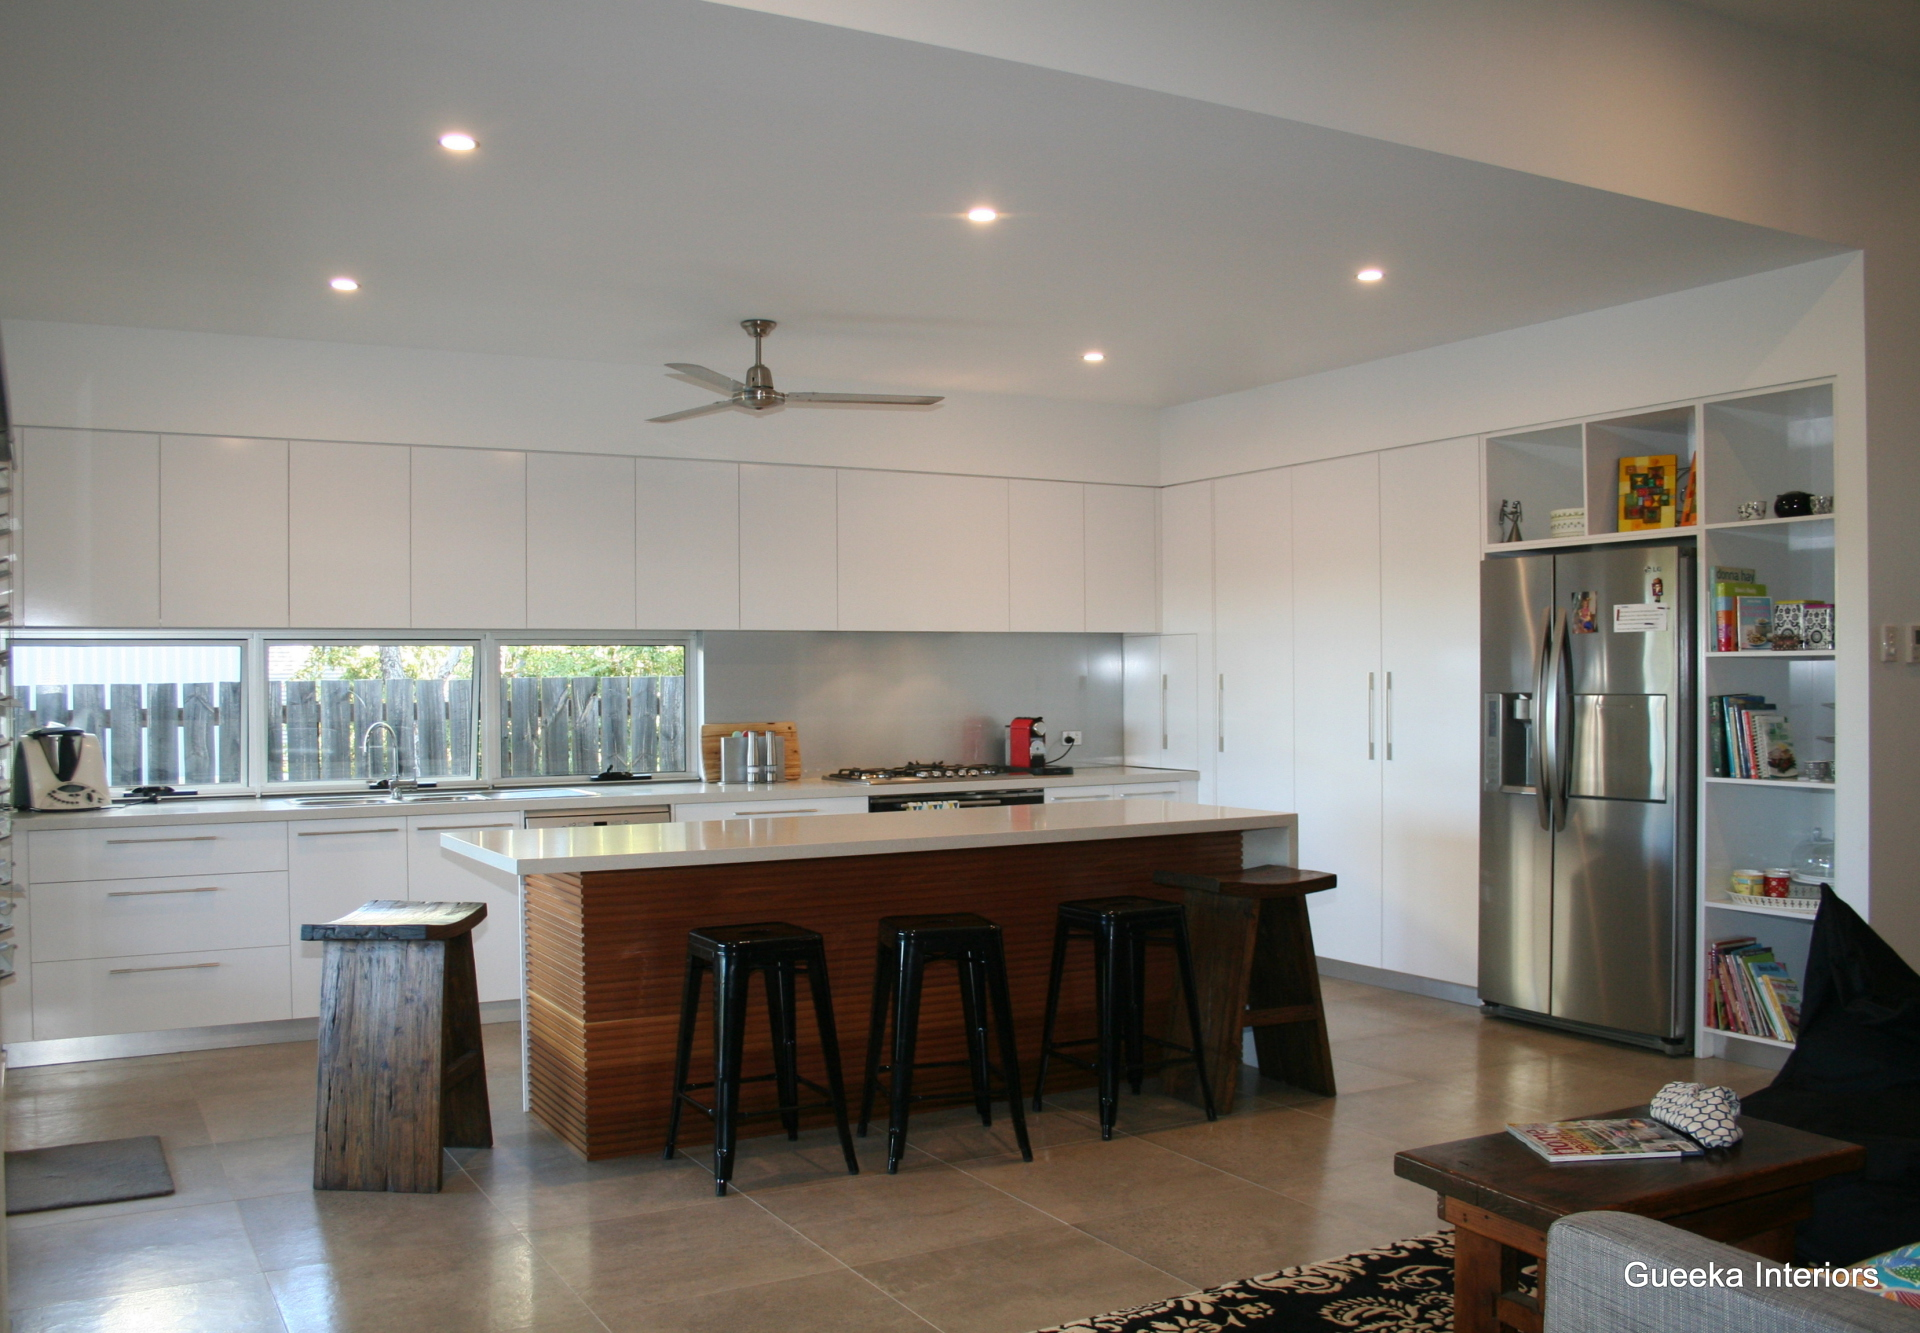 #kitchen #interiordesign #gueekainteriors #residential #homes